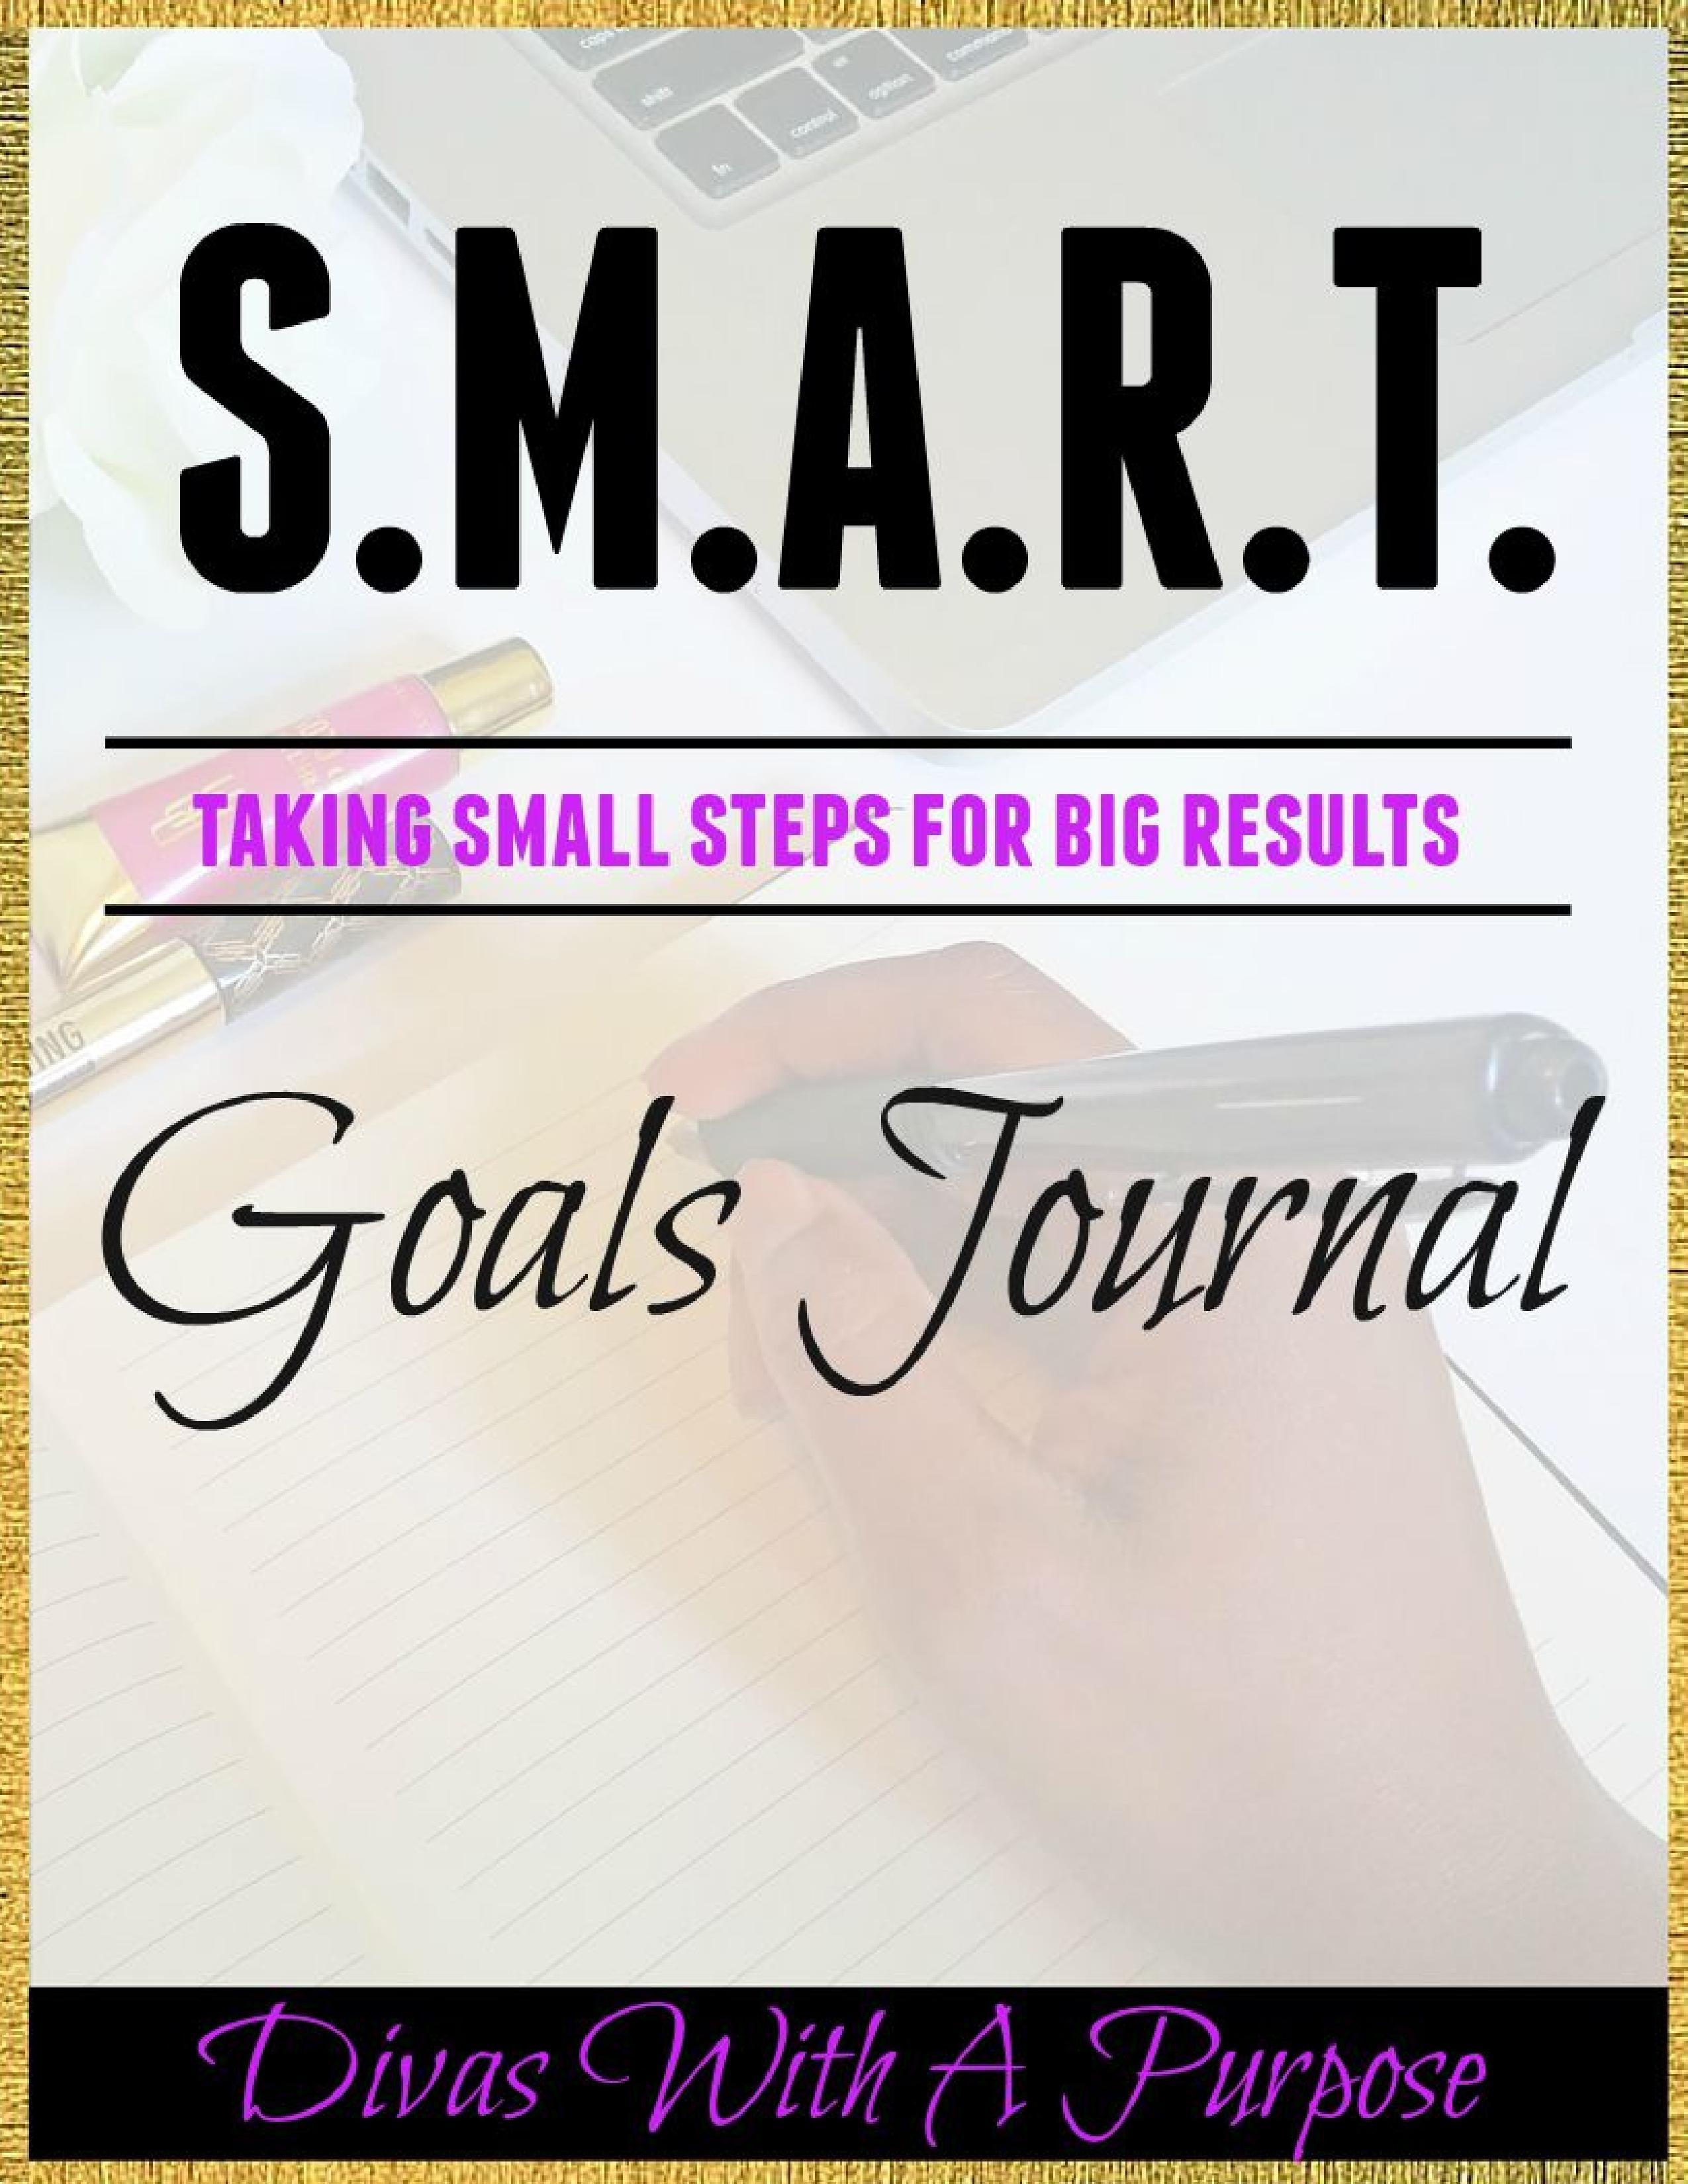 You Can Download A Free Copy Of Our S M A R T Goals